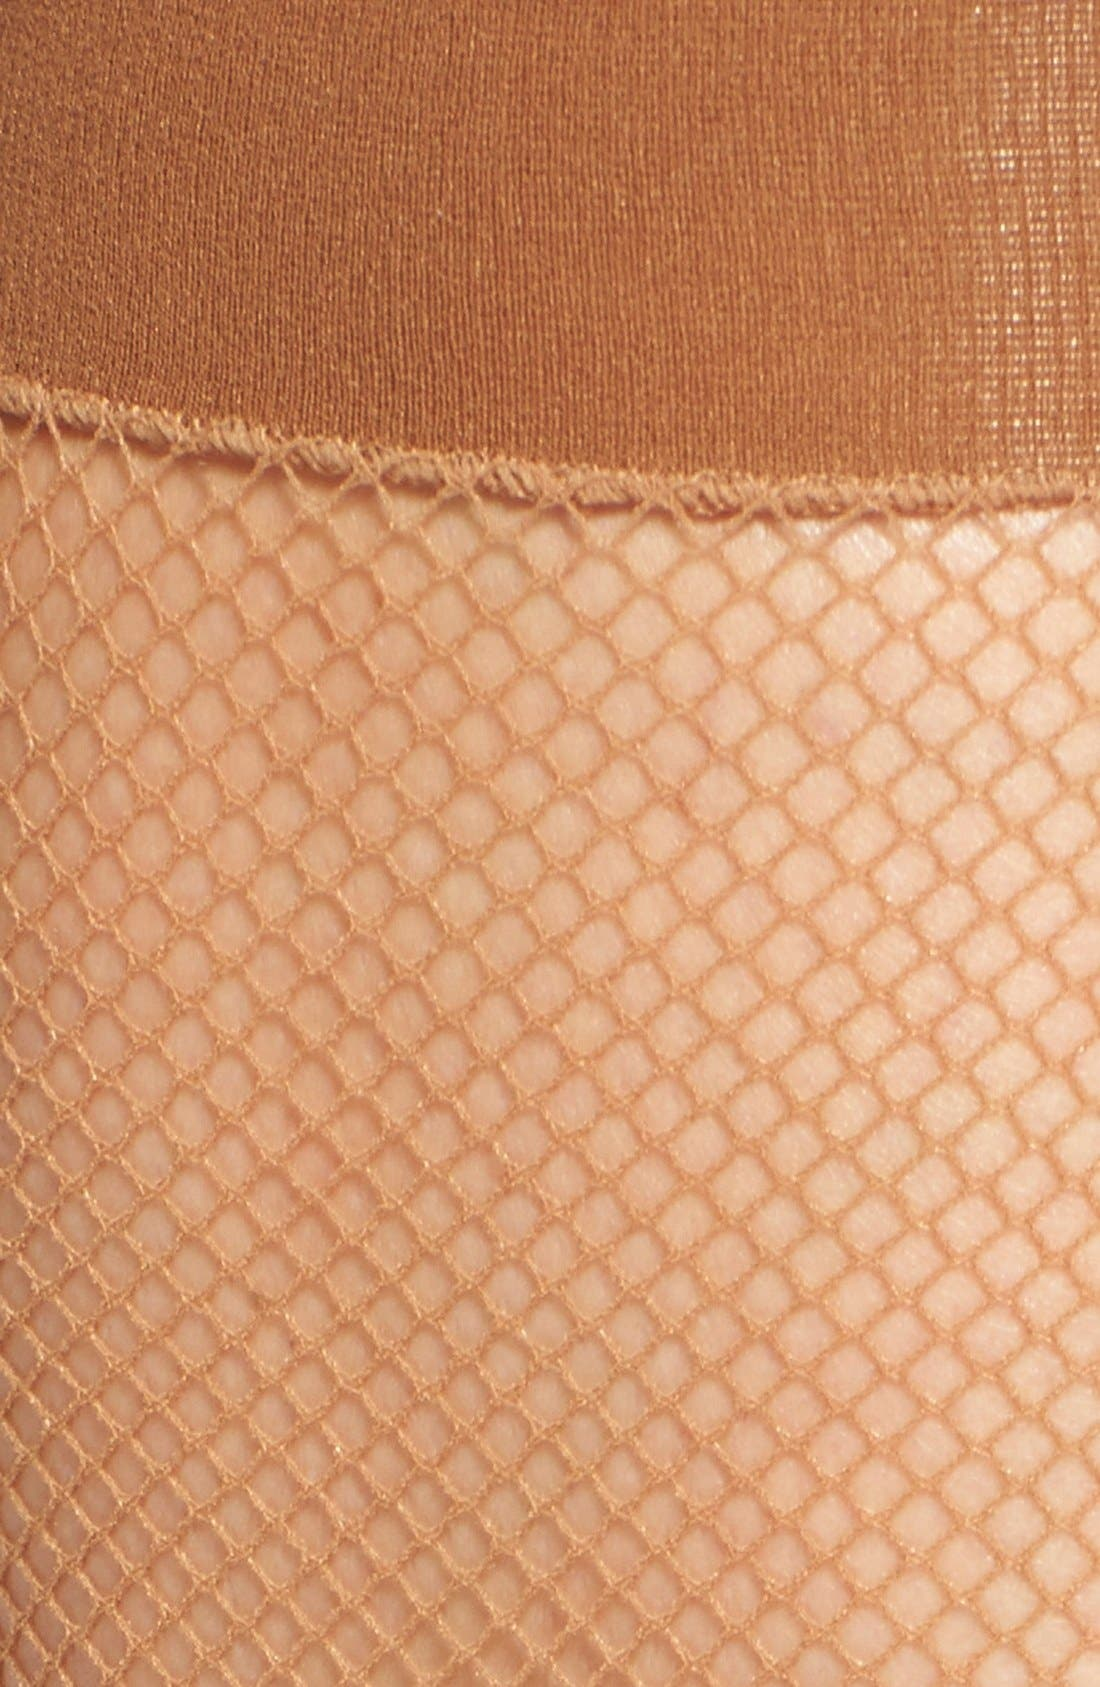 'Twenties' Fishnet Knee High Socks,                             Alternate thumbnail 2, color,                             243